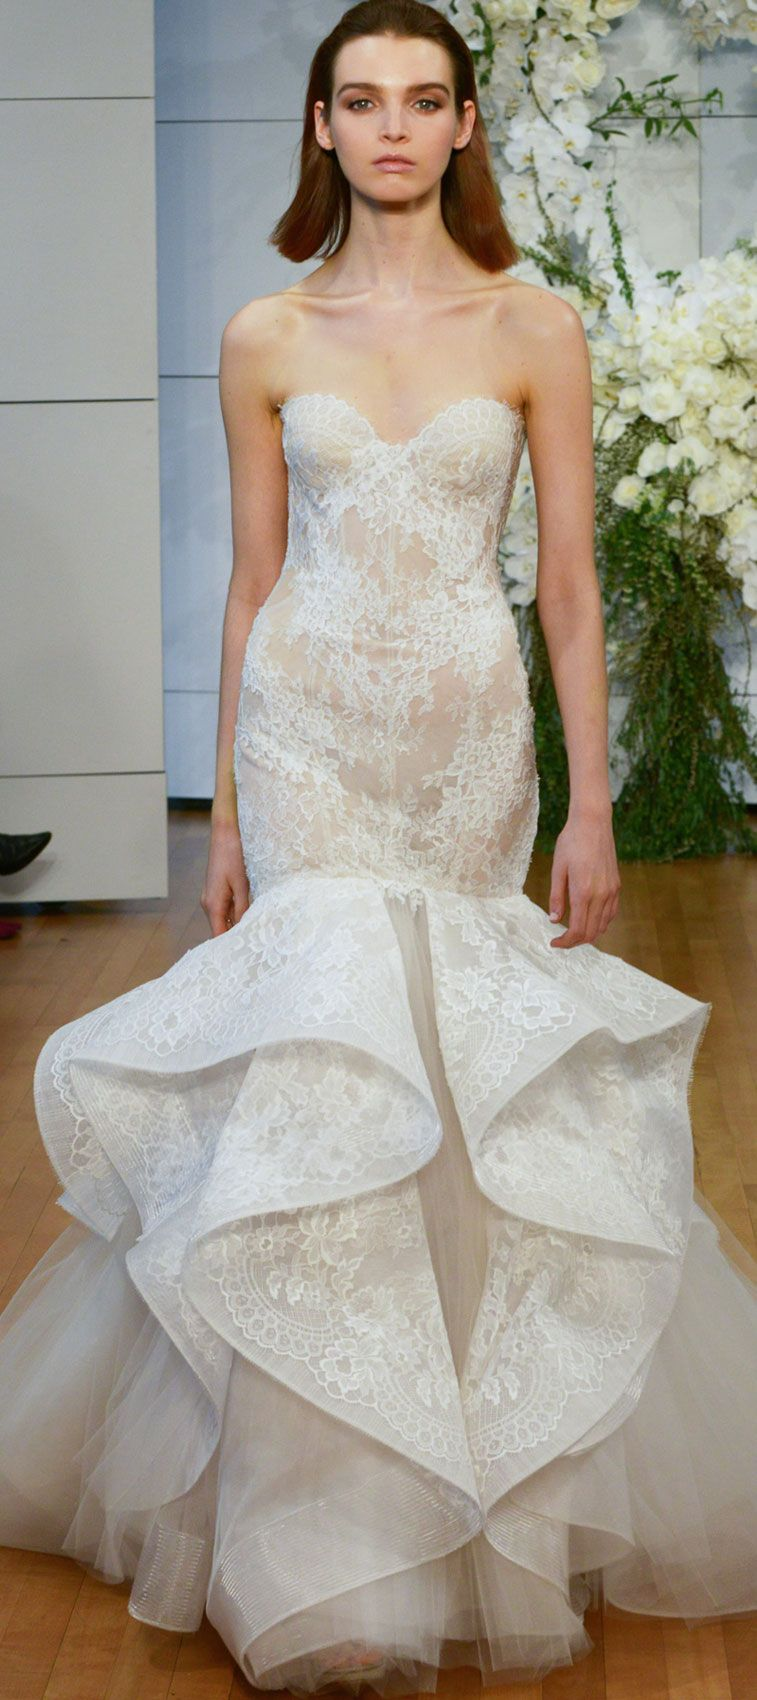 Monique Lhuillier Spring 2018 Wedding Dresses - Fabmood | Wedding ...